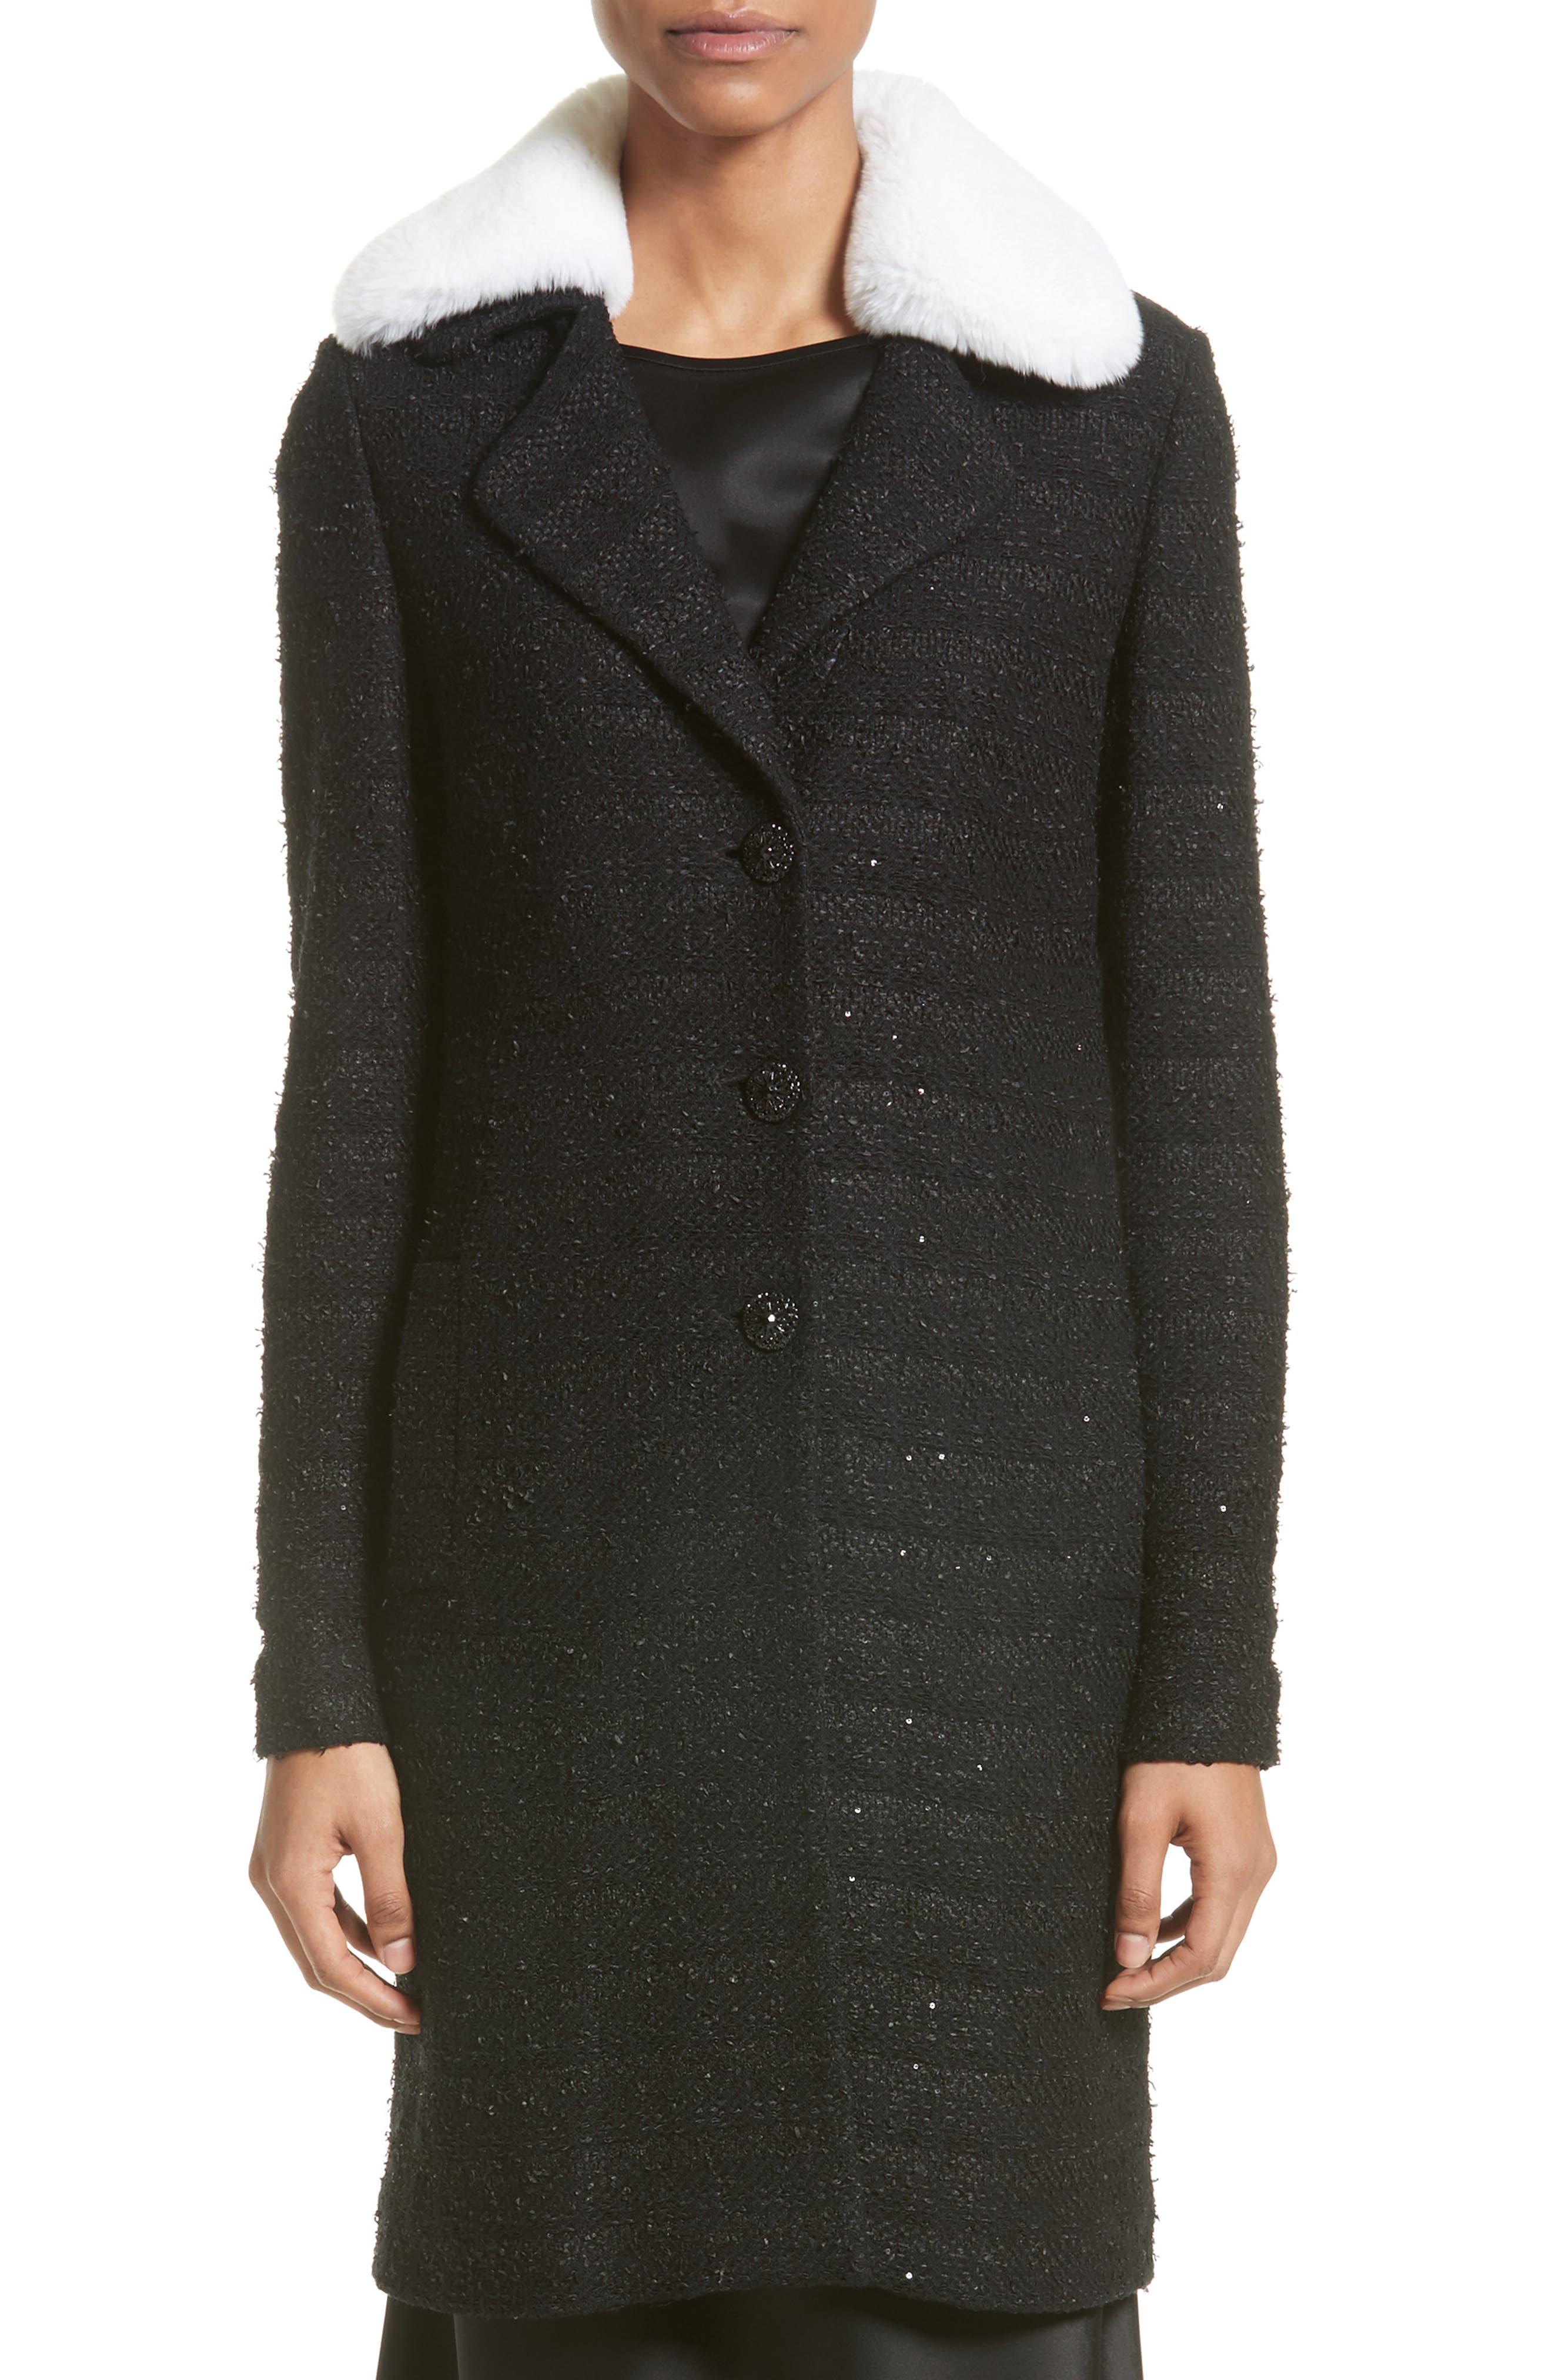 Sequin Knit Topper with Detachable Genuine Rabbit Fur Collar,                         Main,                         color, 001